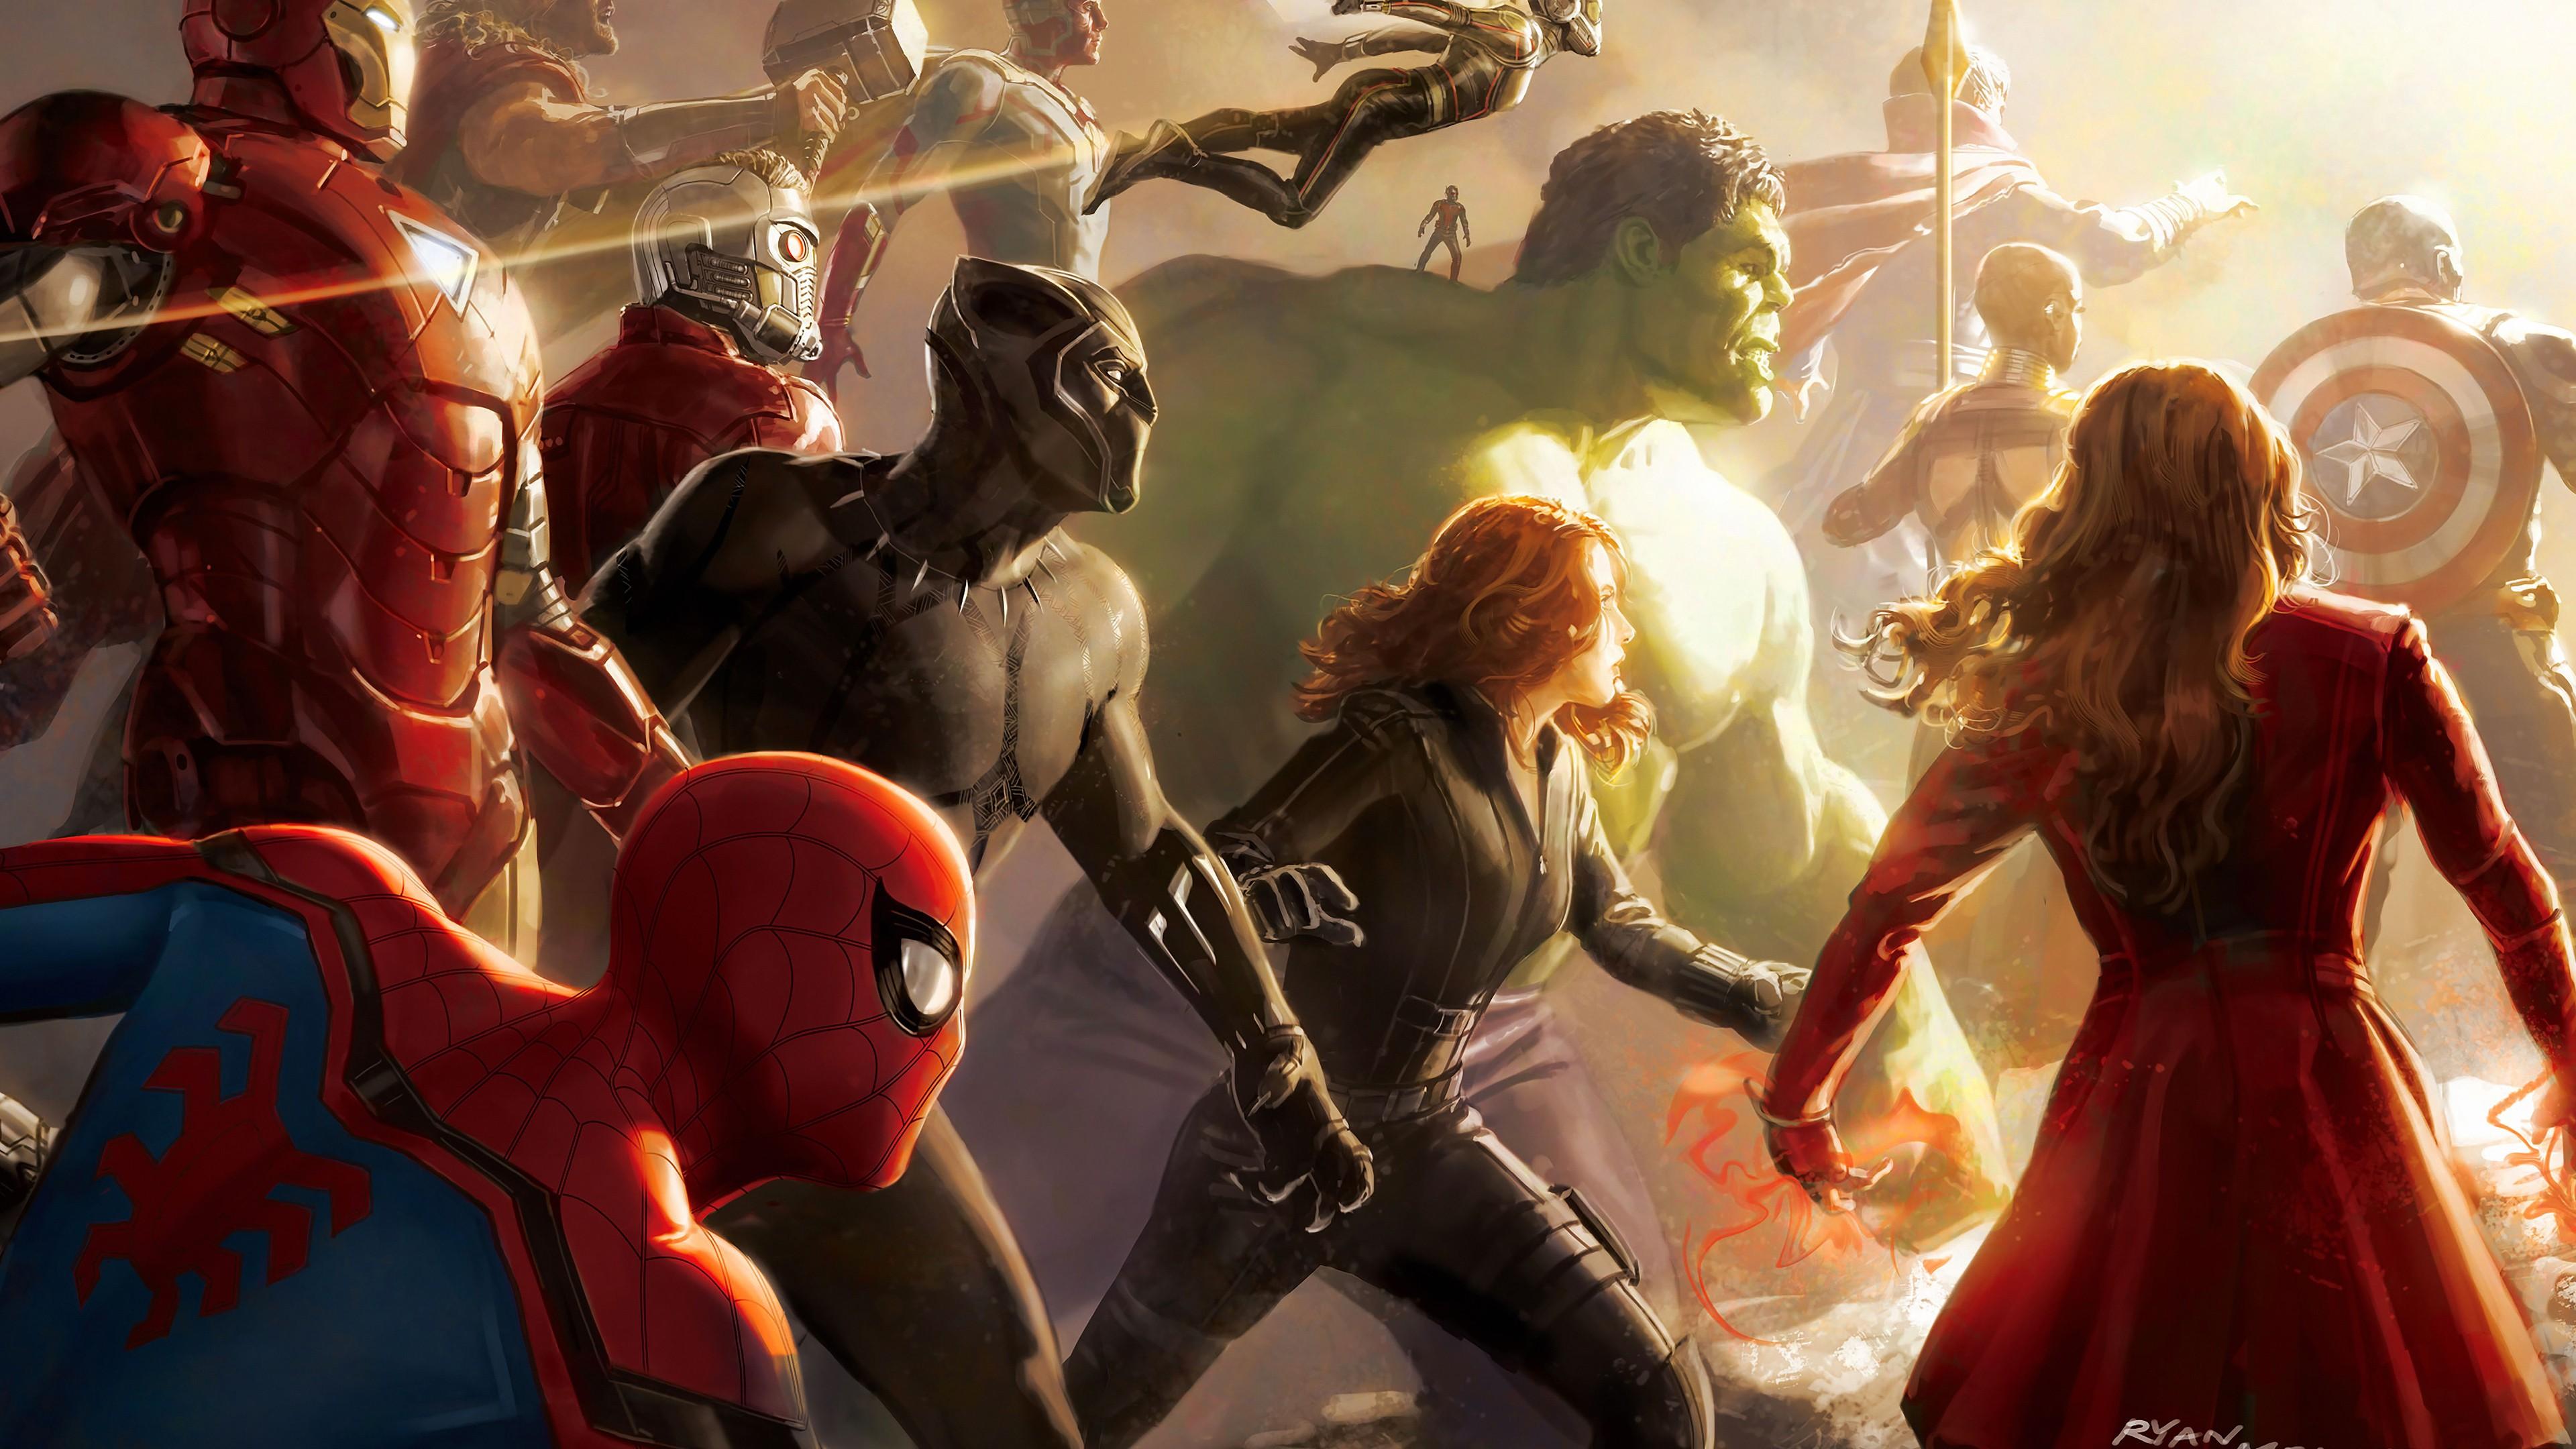 Free Download Avengers Thanos Infinity War Hd Wallpaper